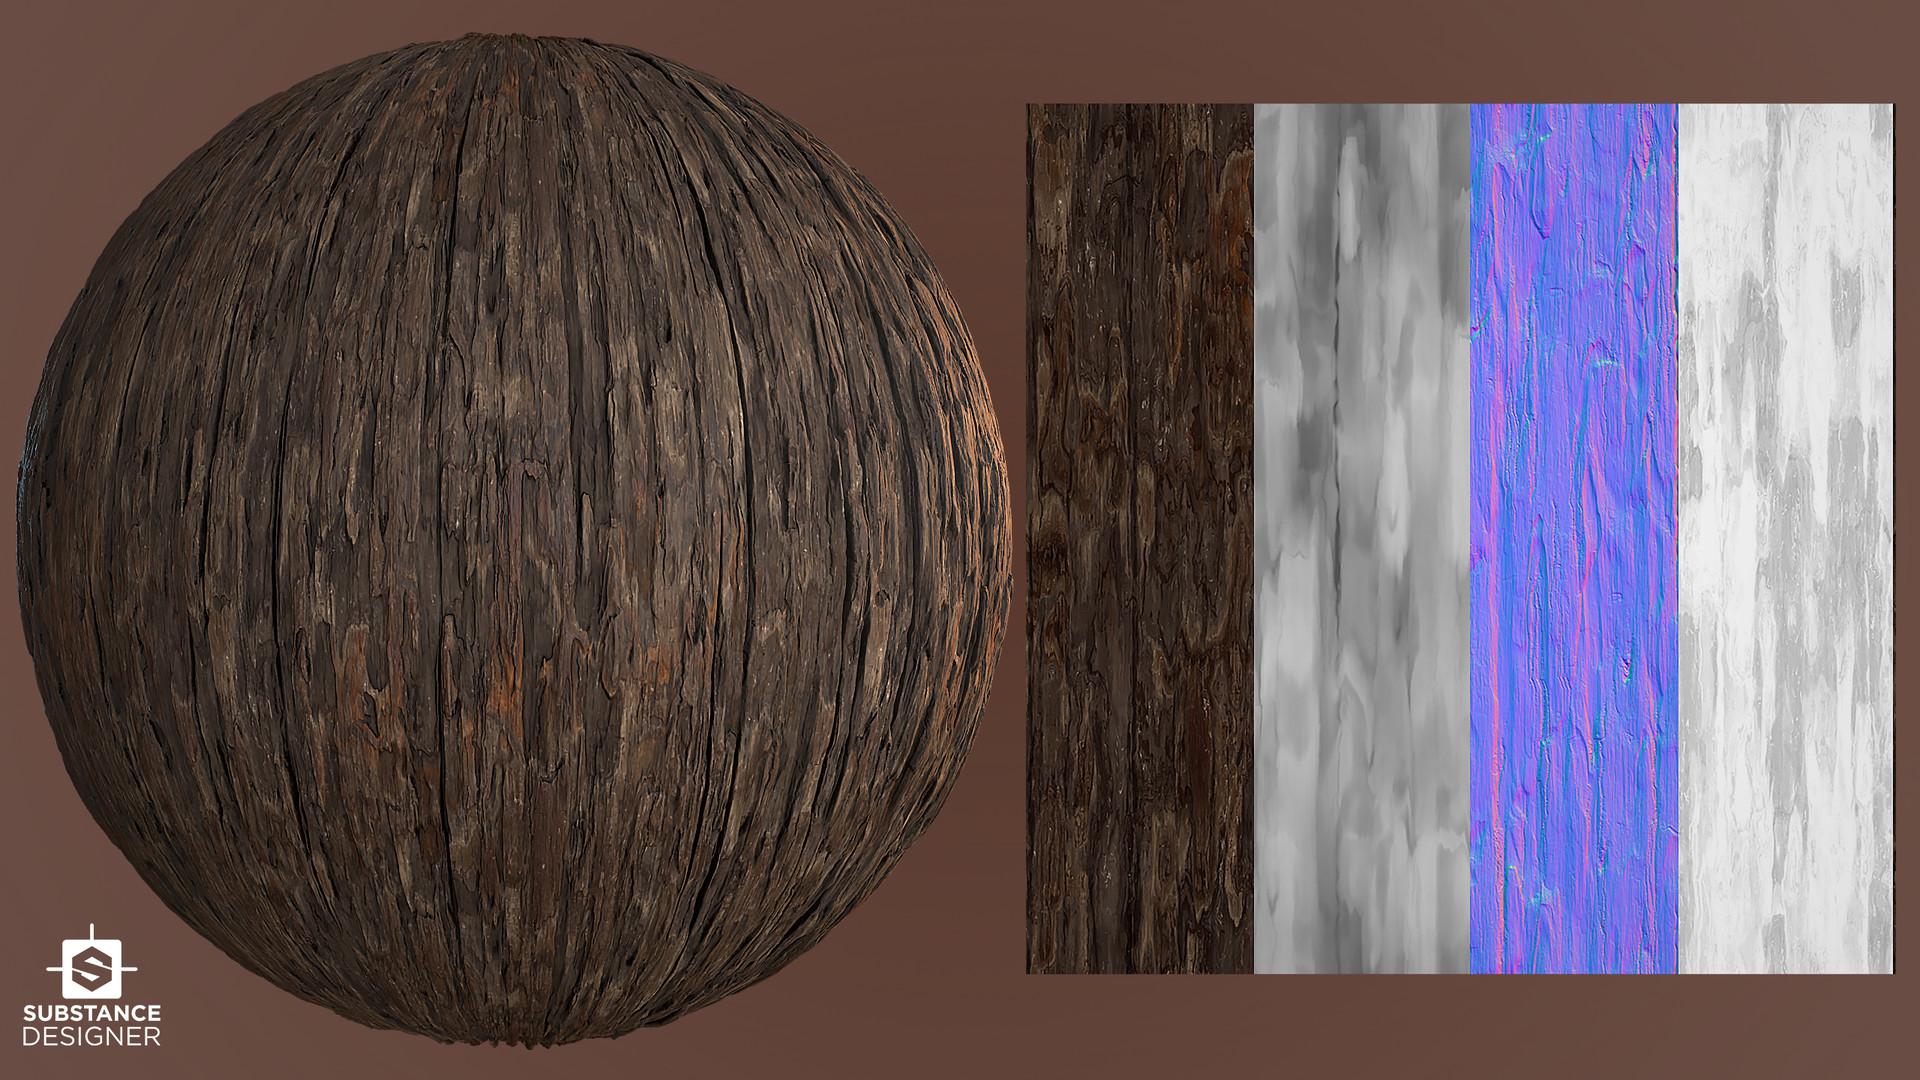 Johan qvarfordt jq wood rough 03 04